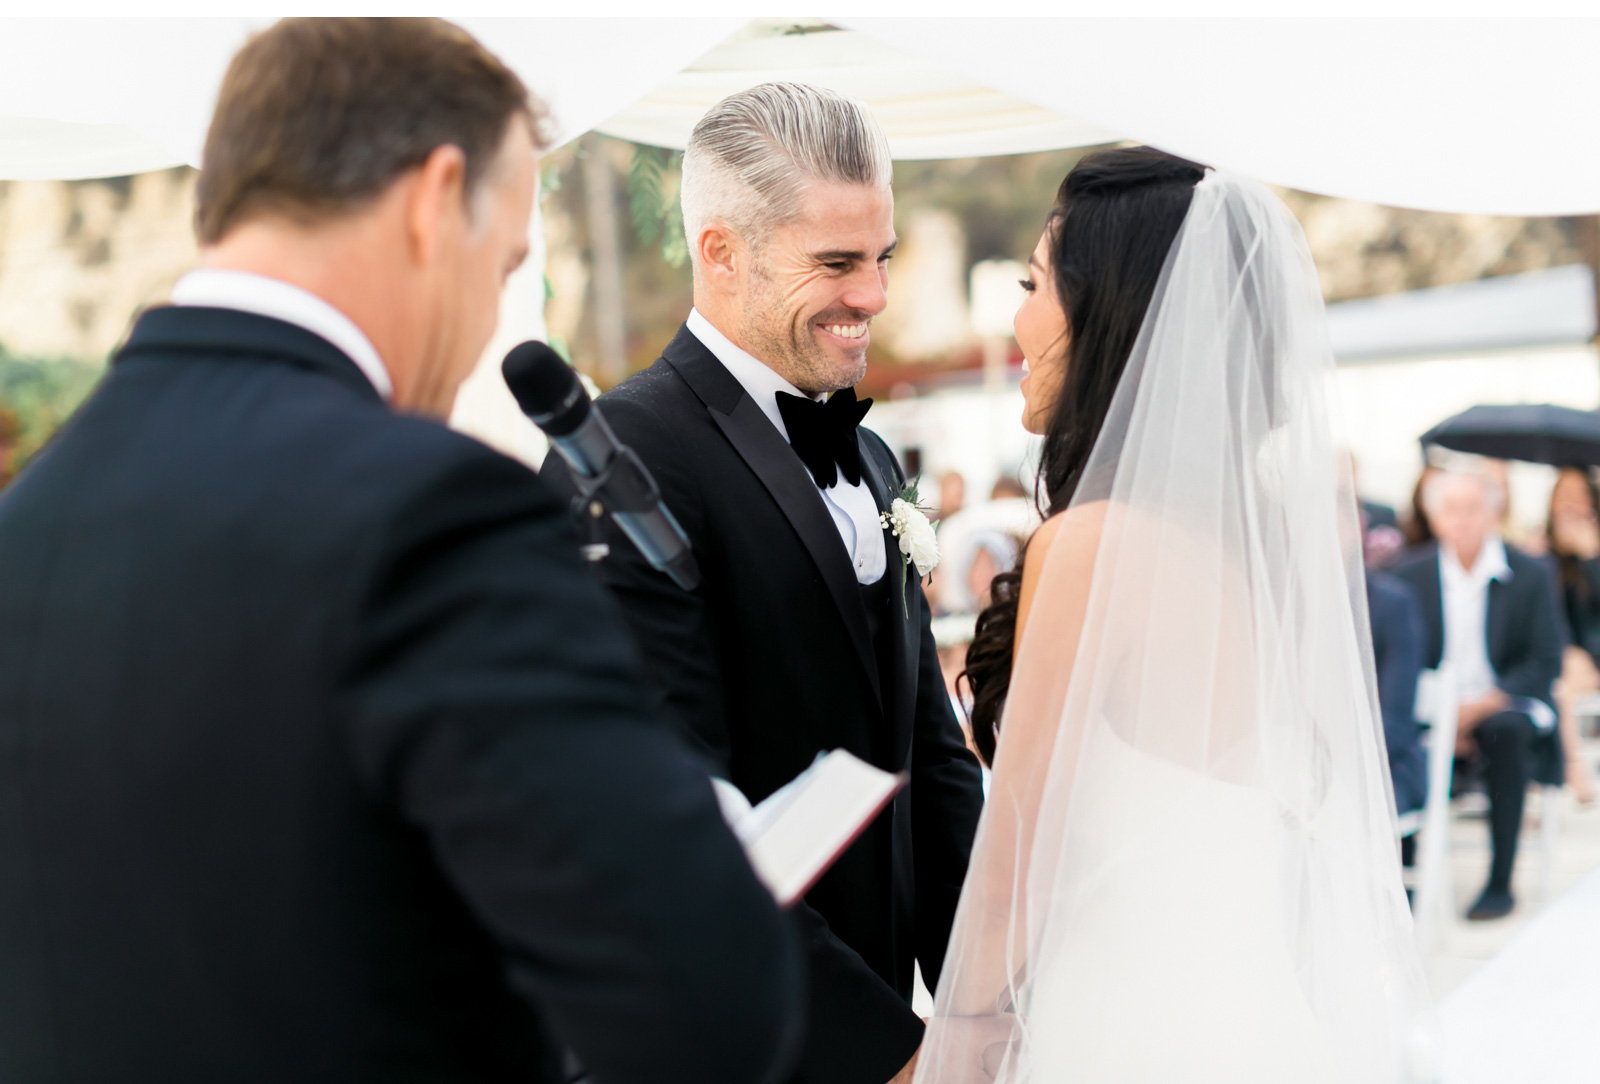 Malibu-Wedding-Natalie-Schutt-Photography-Style-Me-Pretty_15.jpg